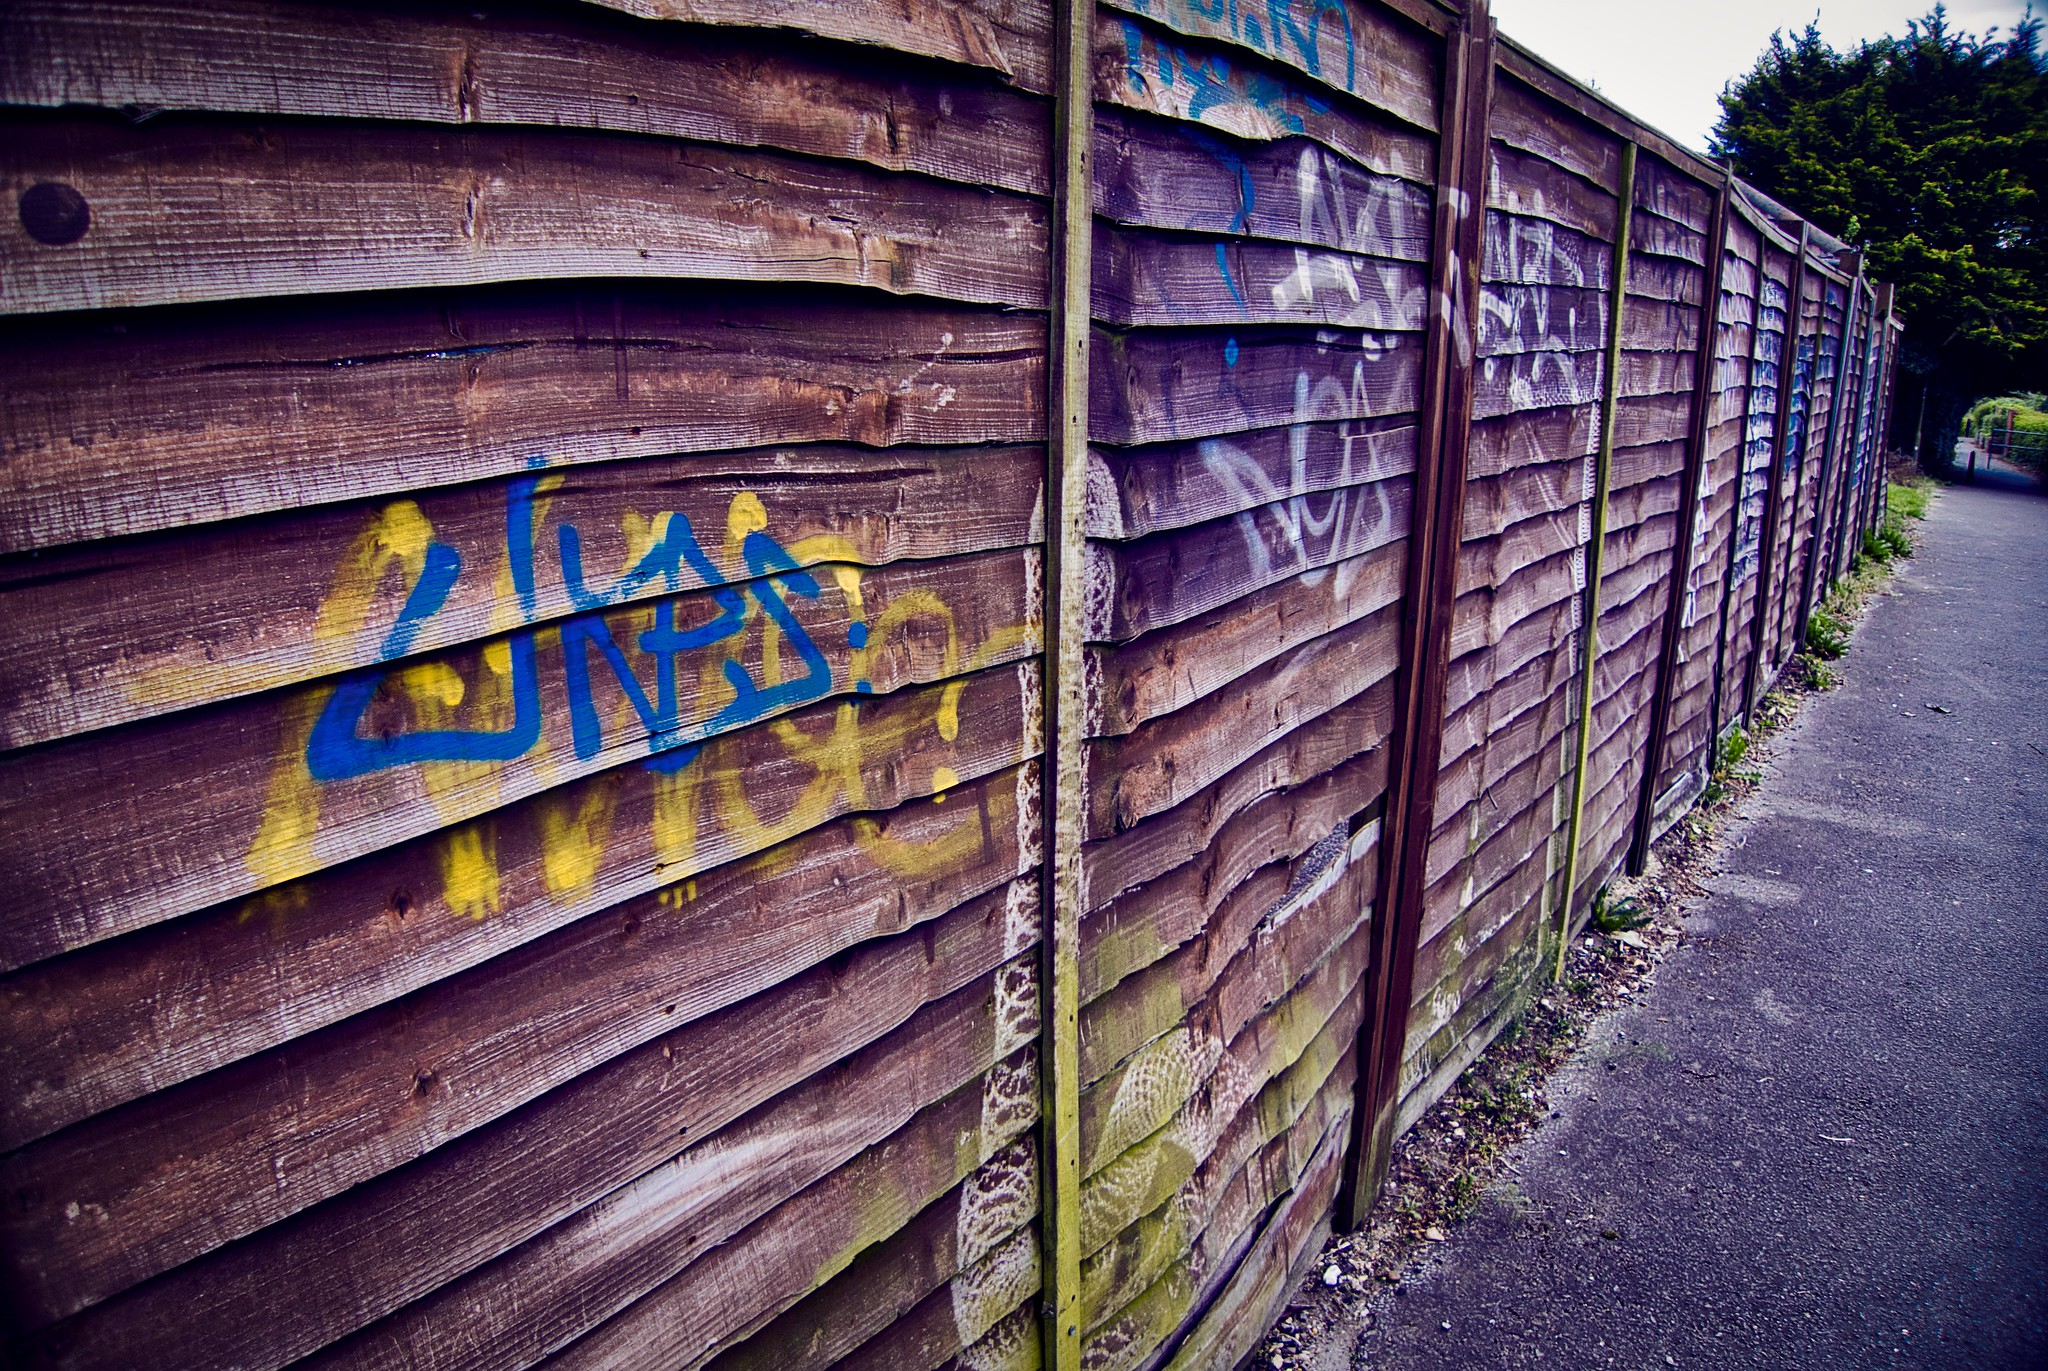 Urban Decay - Graffiti Tagging